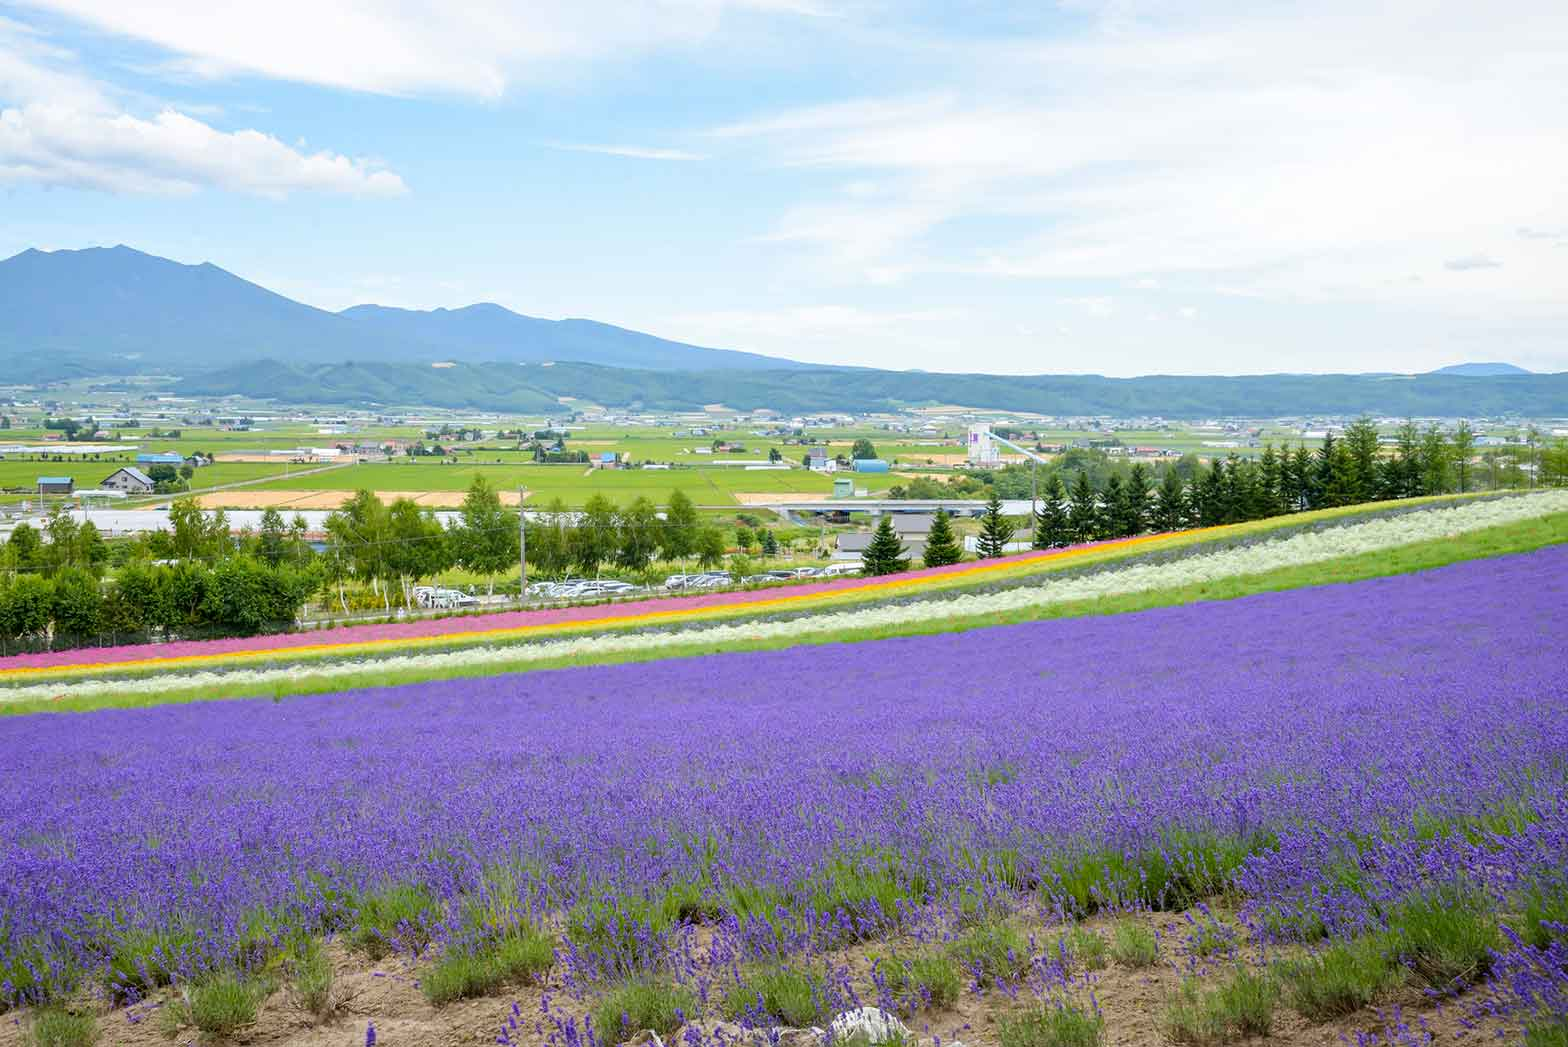 Colorful Lavender Farm